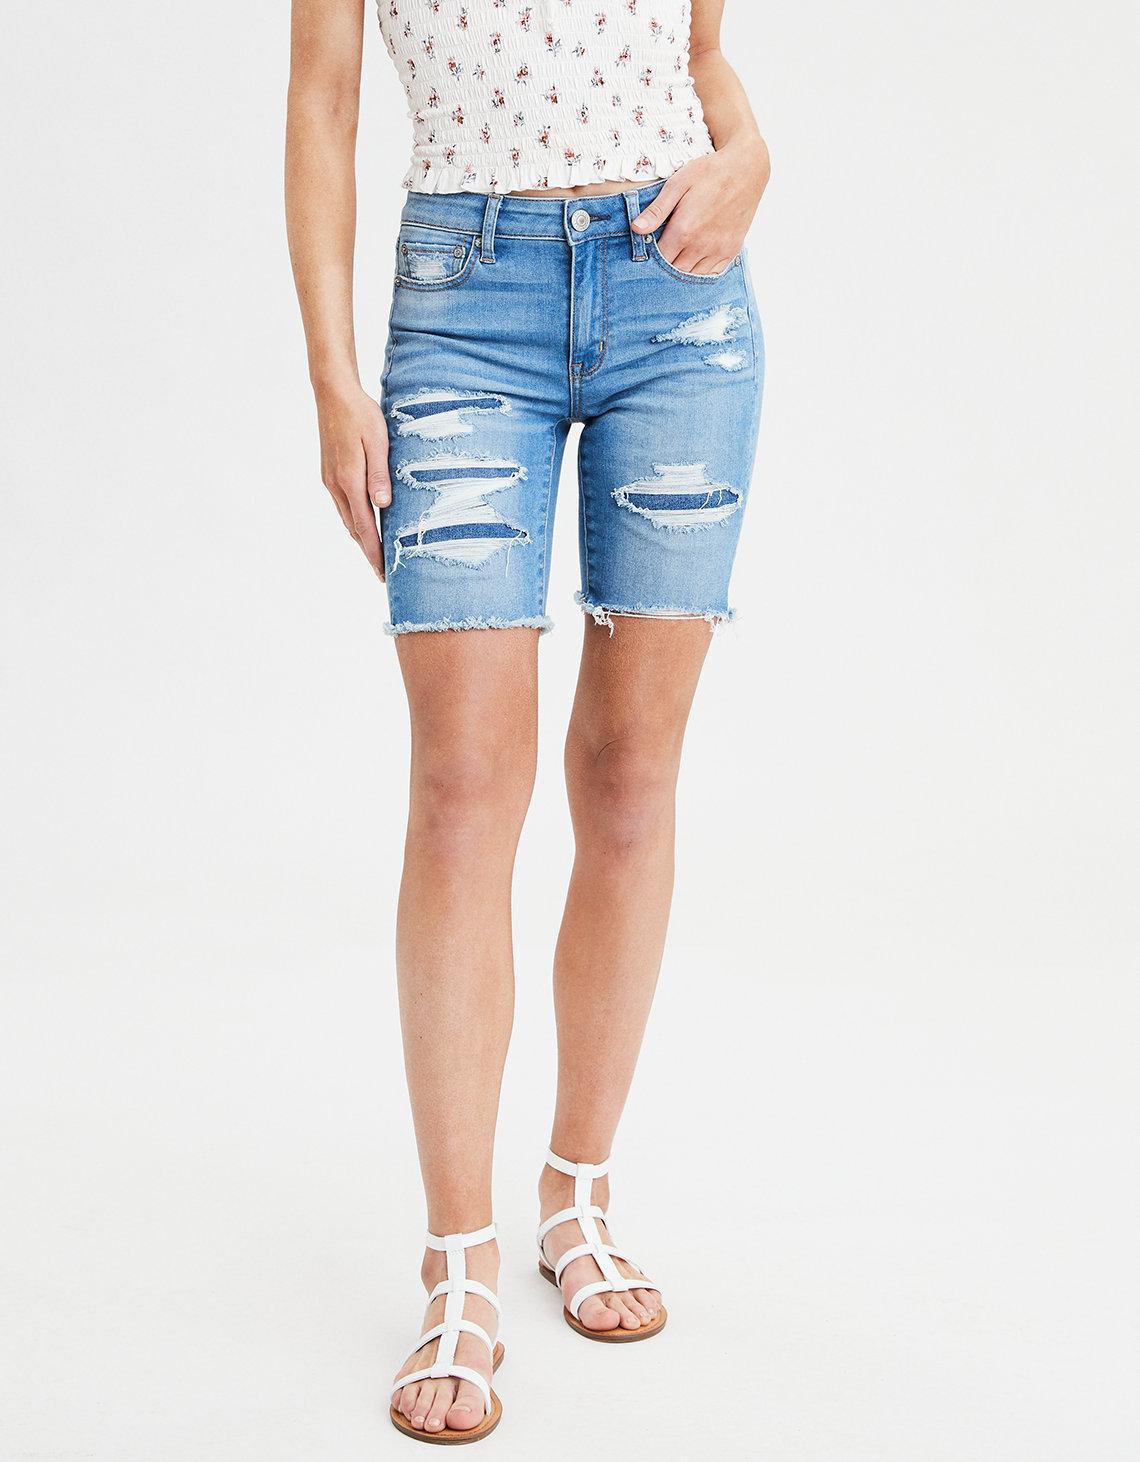 ec33b5000f7 American Eagle. Women s Blue Ae Ne(x)t Level High-waisted Skinny Bermuda  Short